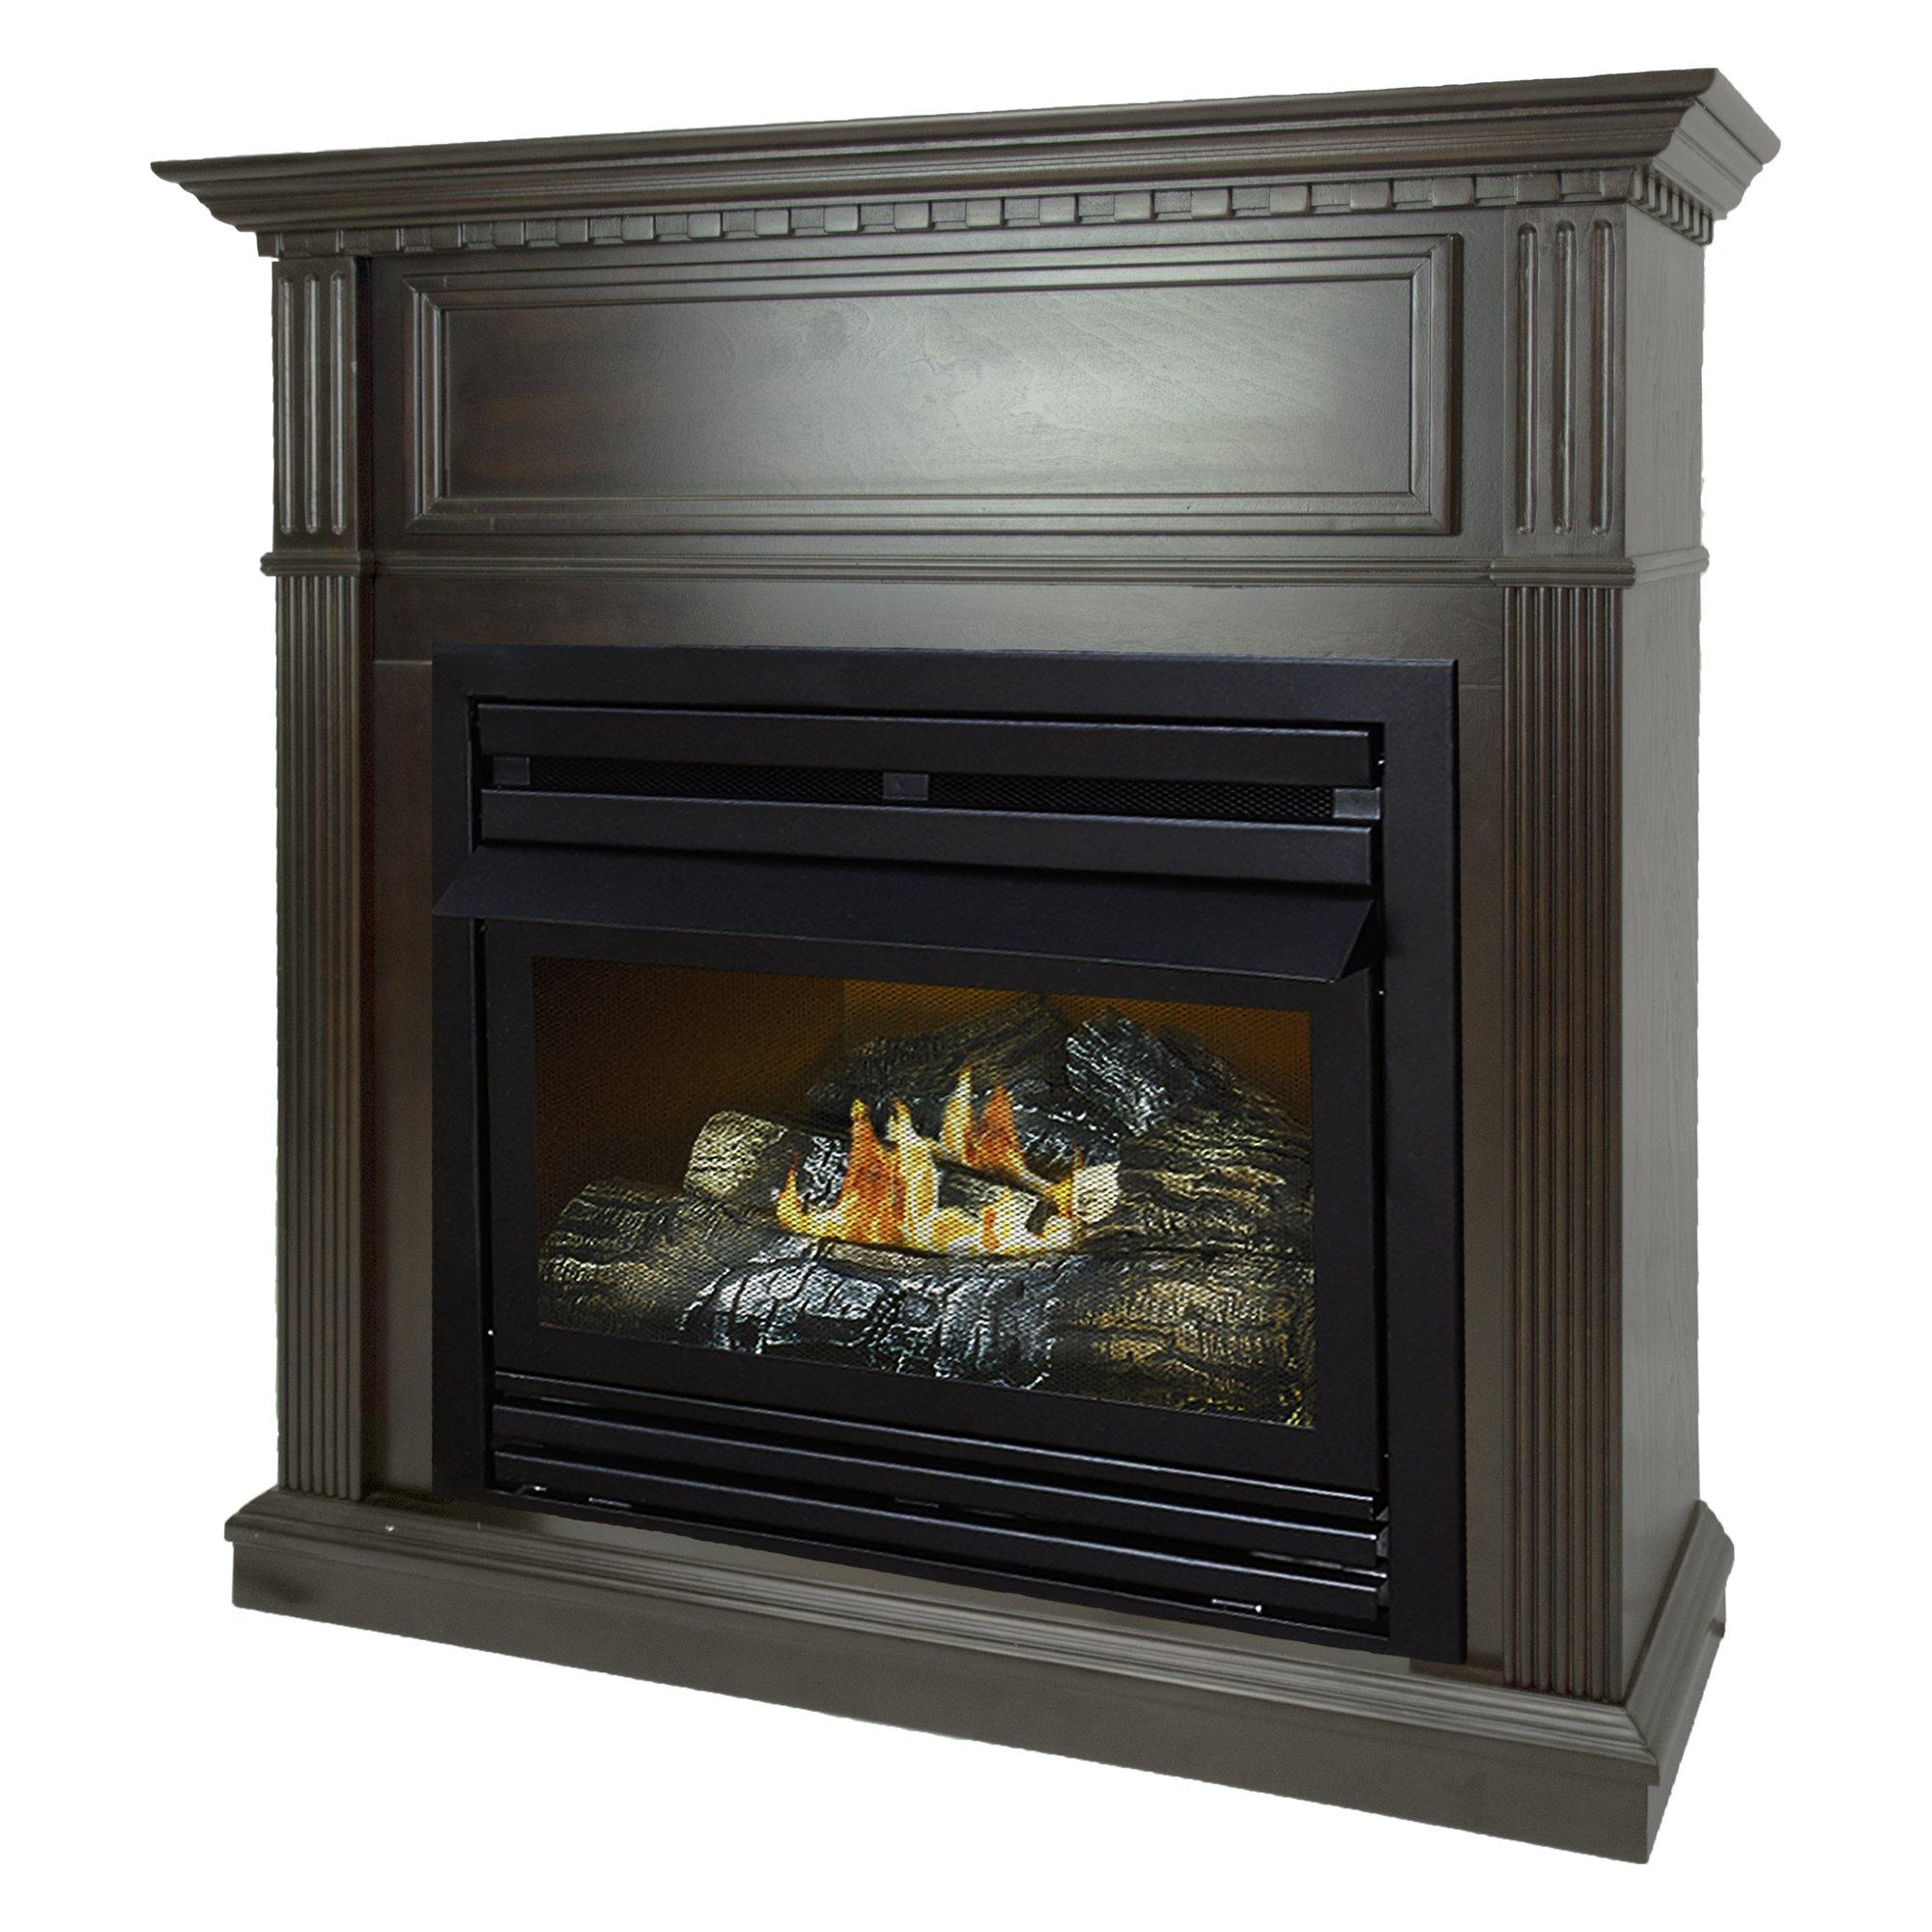 Pleasant Hearth 42 Intermediate Natural Gas Vent Free Fireplace System 27,500 BTU, Rich Tobacco by Pleasant Hearth